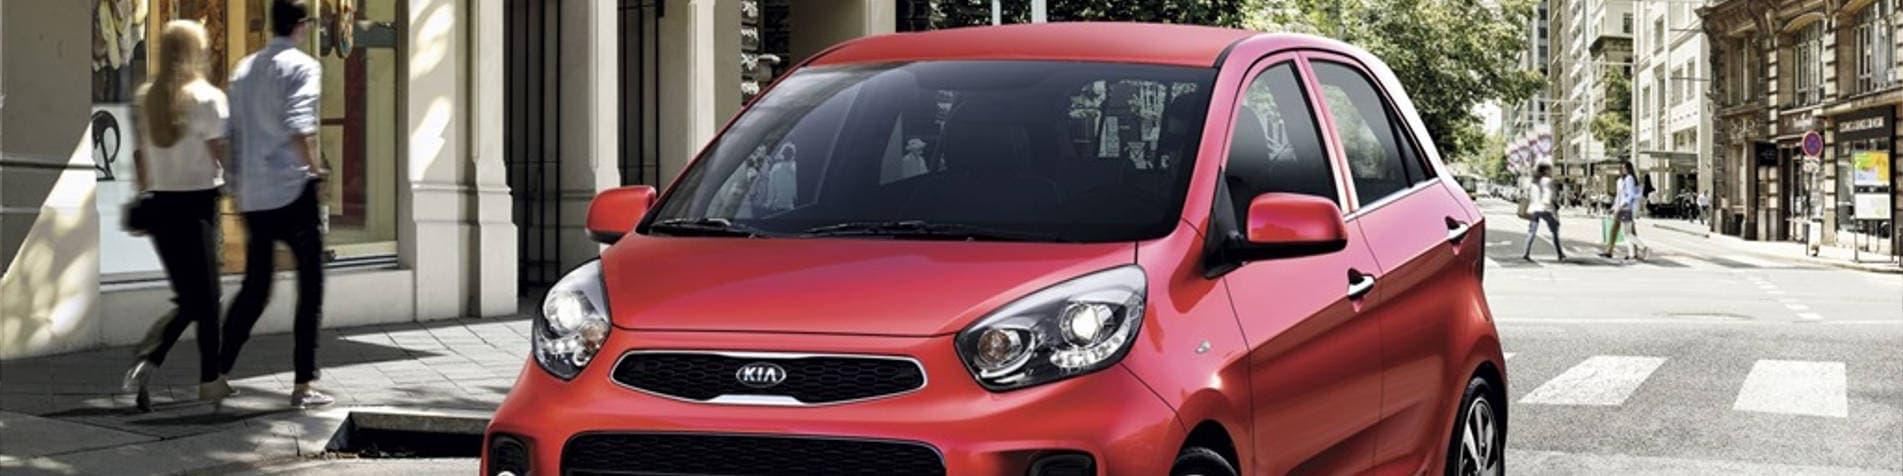 Kia Picanto header